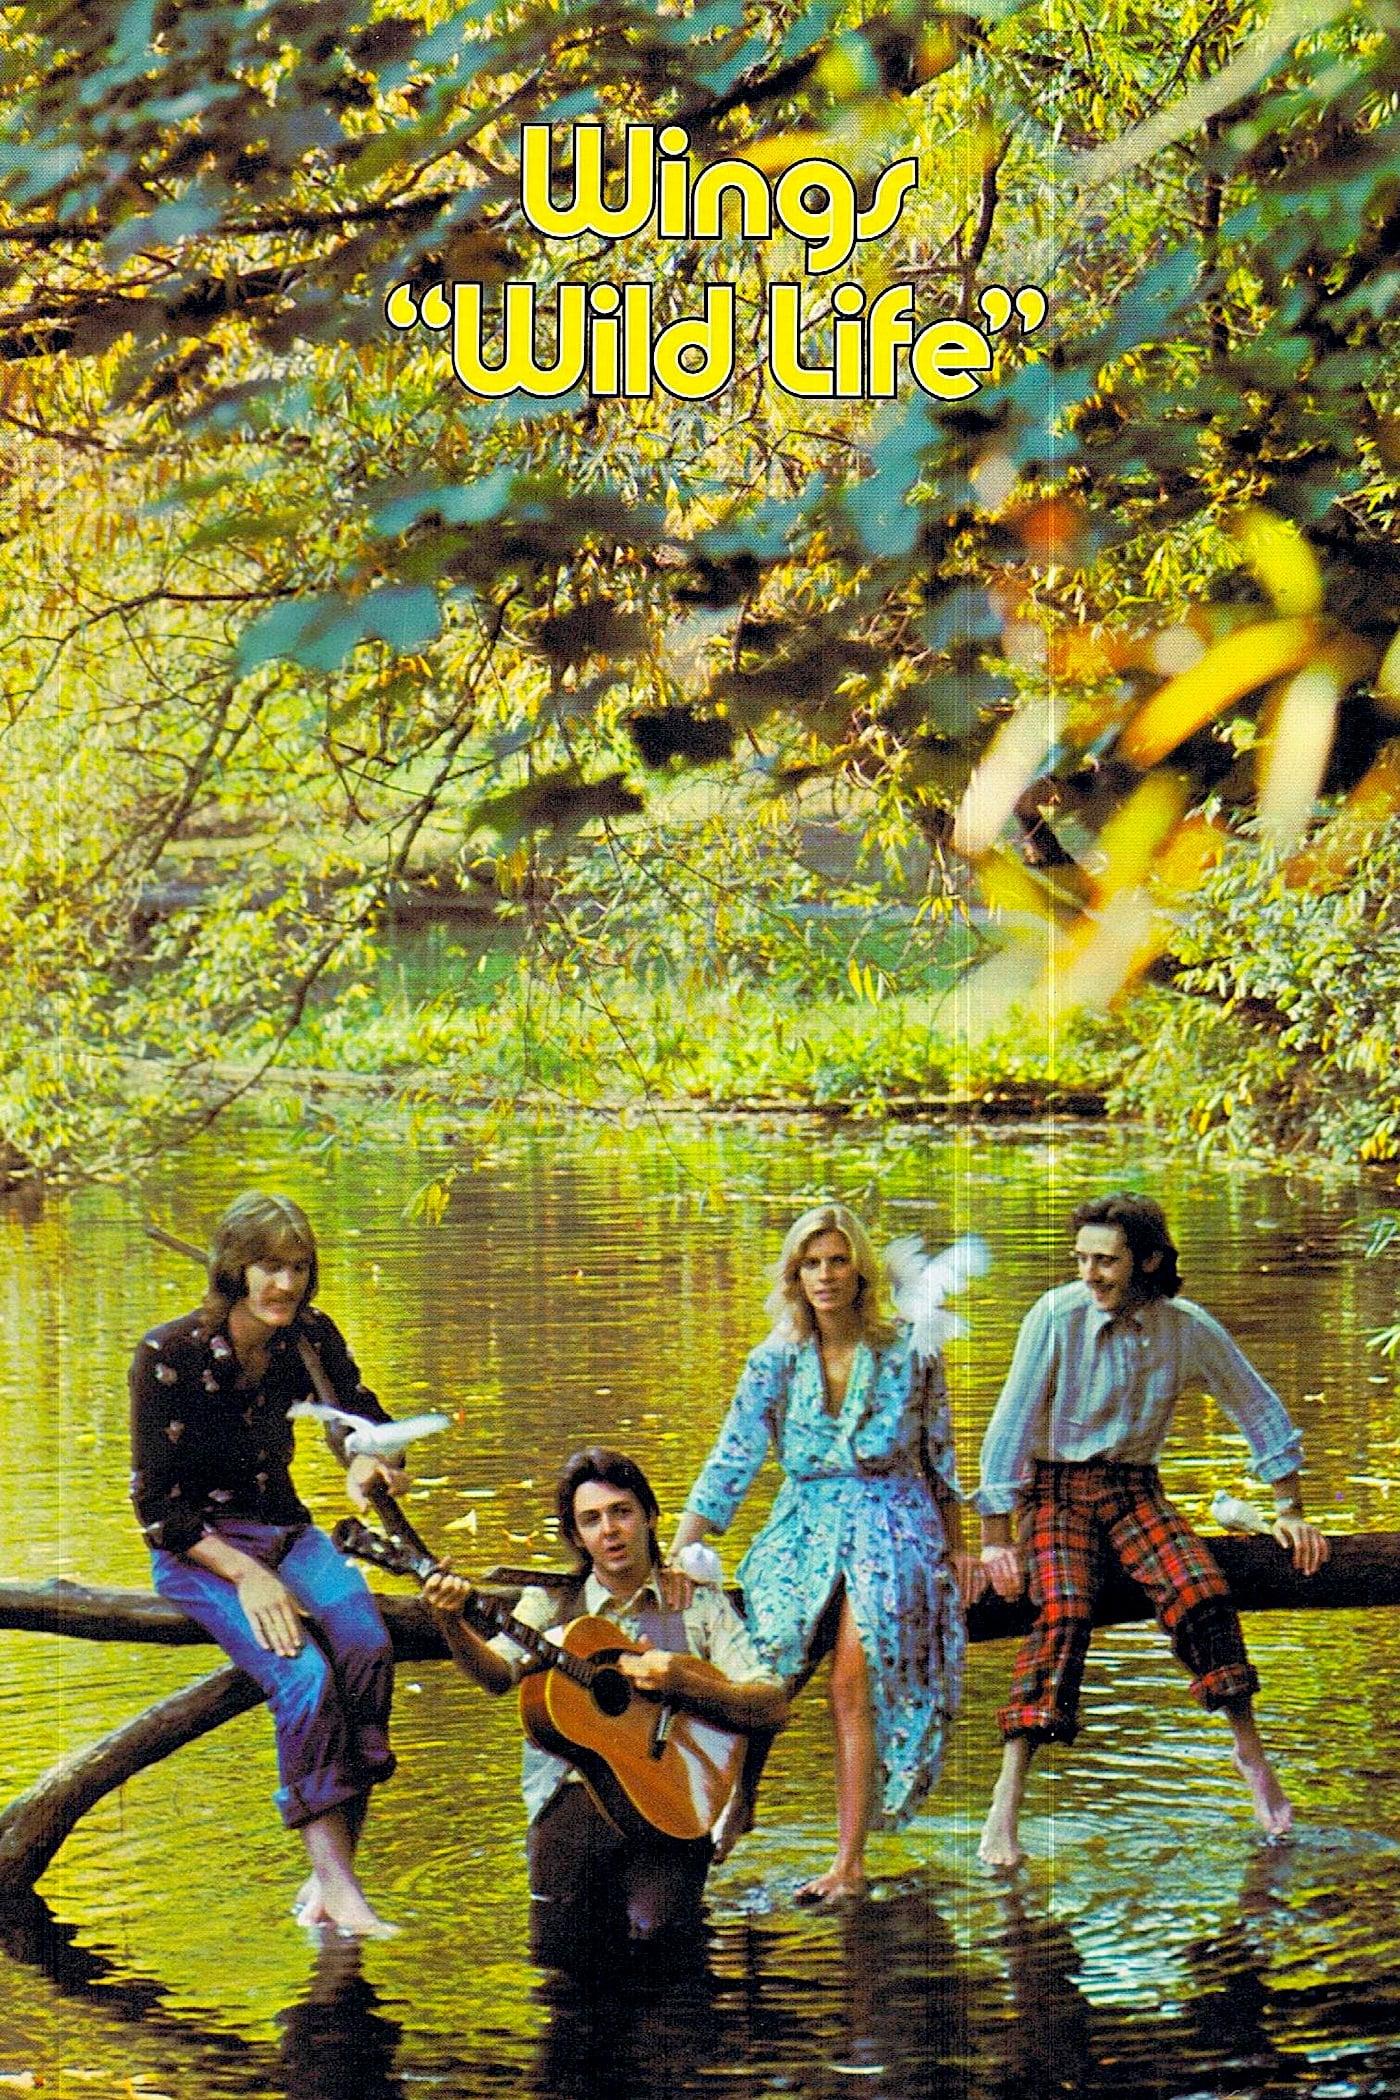 Paul McCartney & Wings: Wild Life